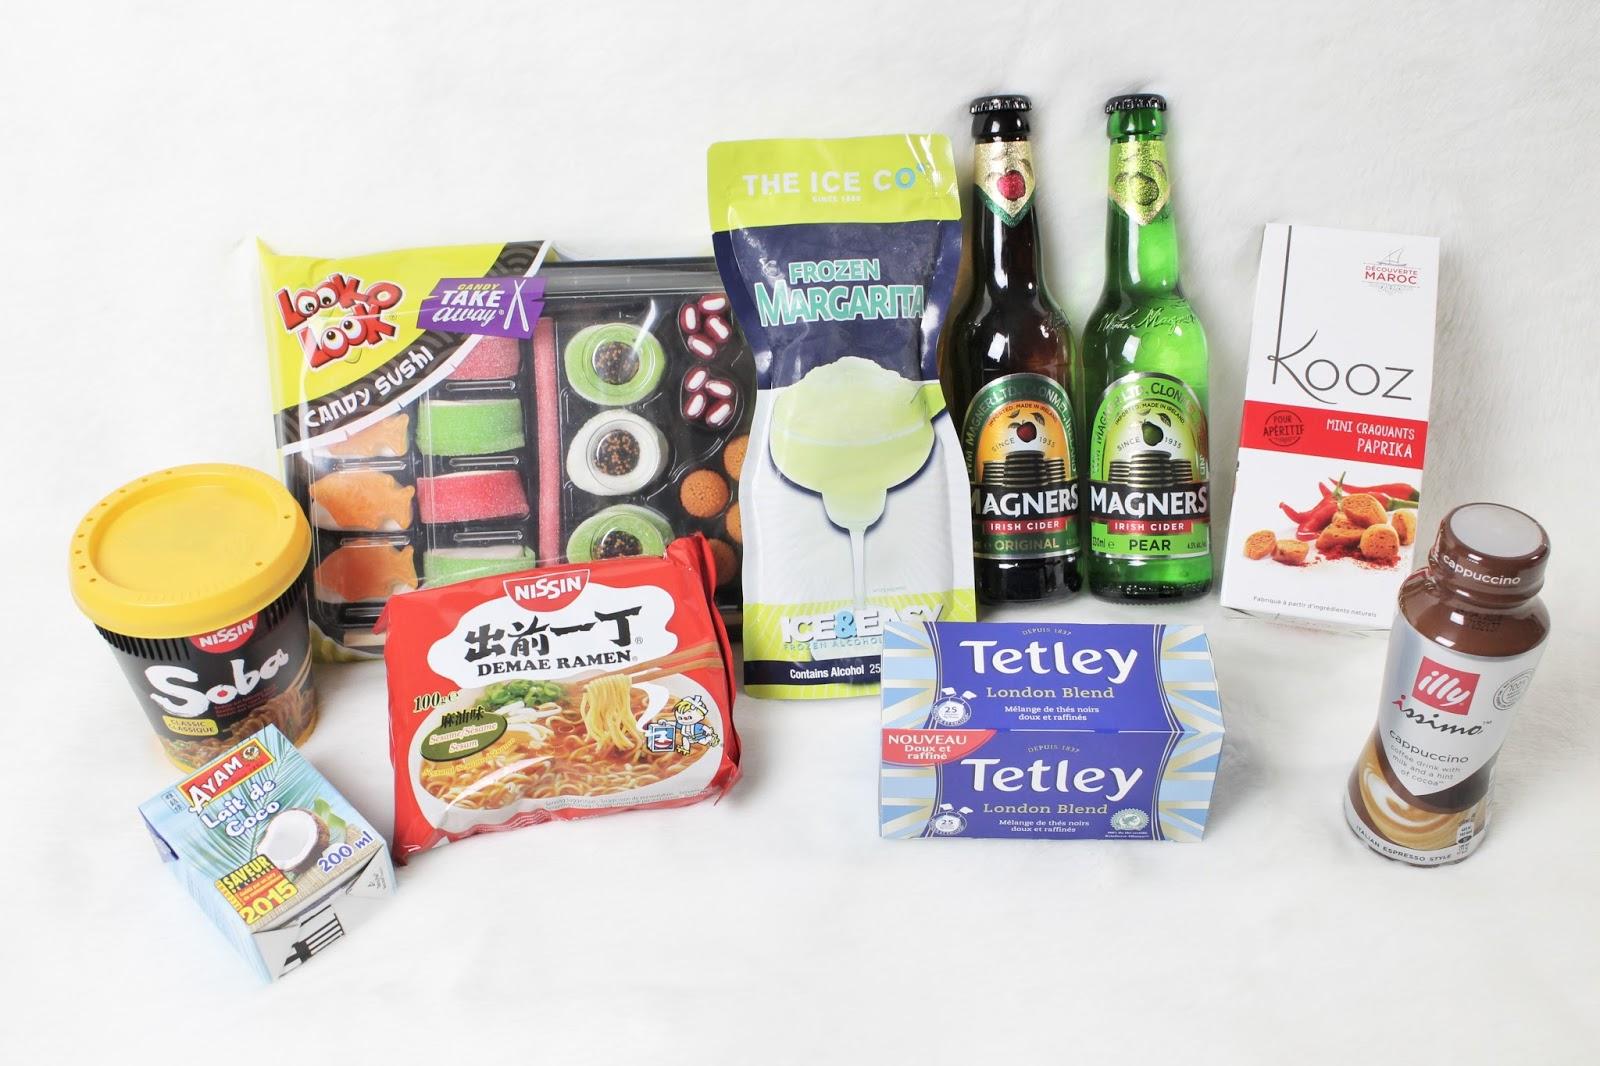 degustabox box food fevrier 2016 code promo bon plan reduc parrainage offert parrain illy tetley